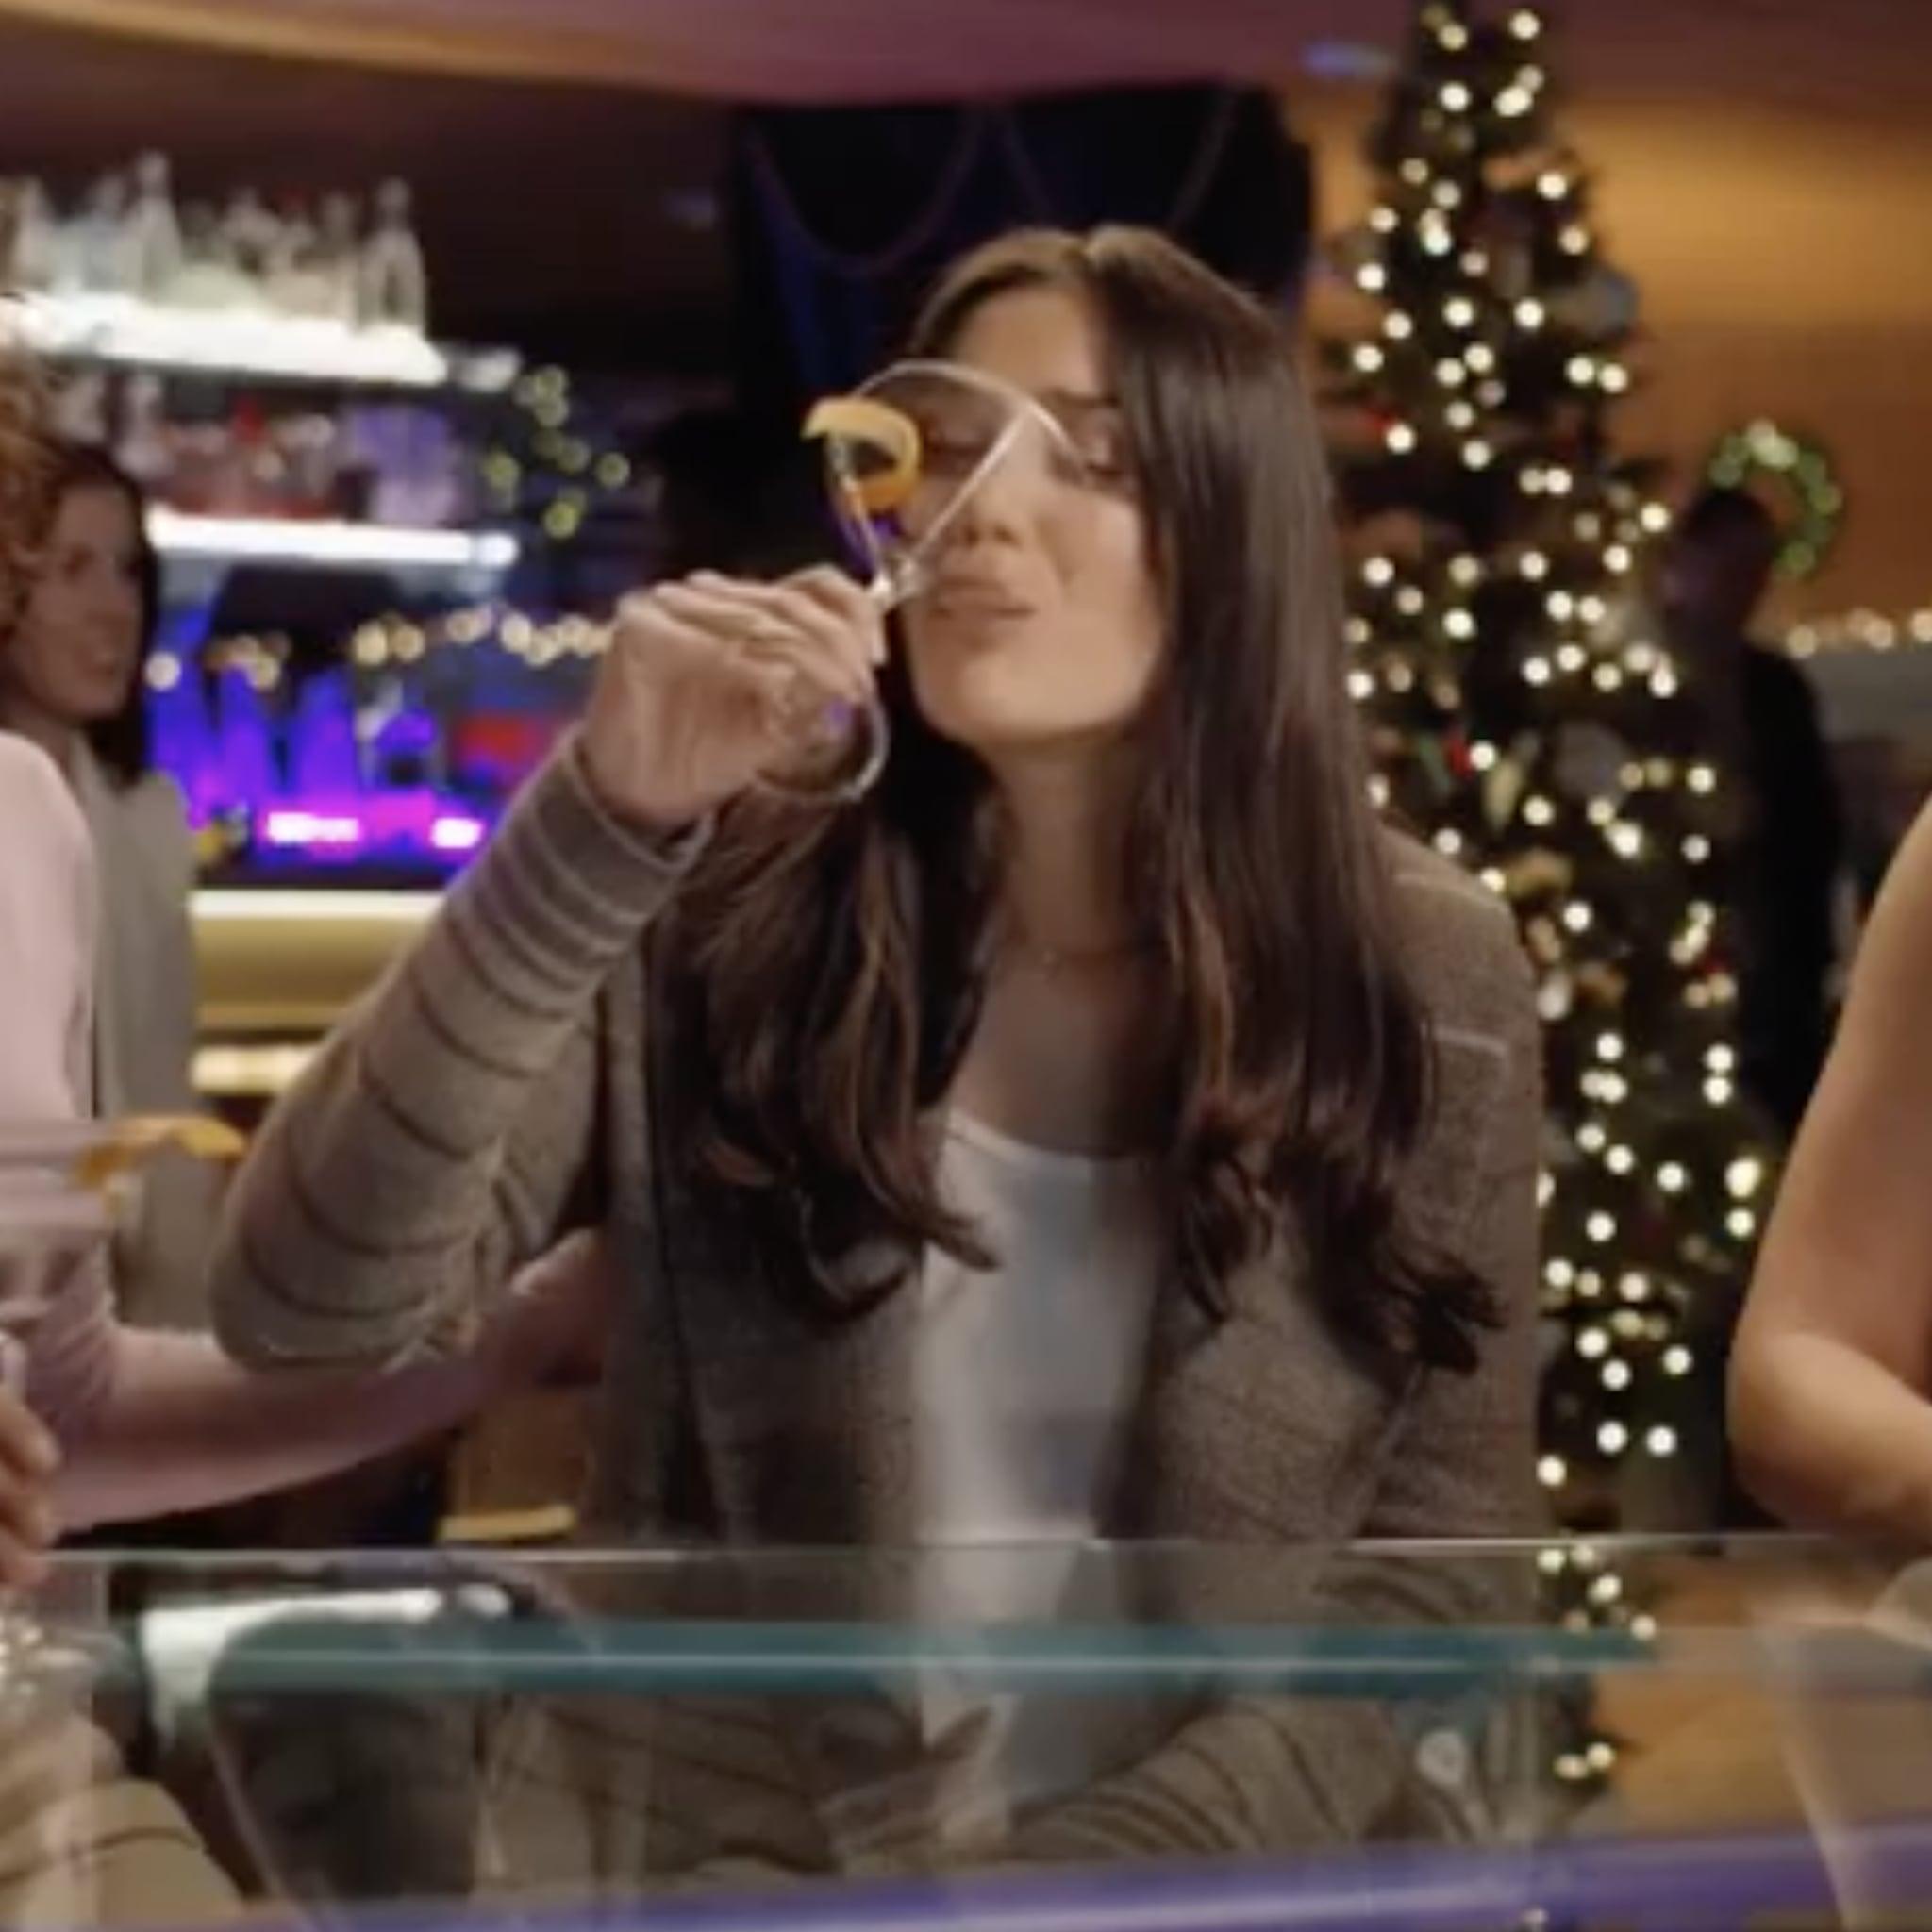 ryan-reynolds-peloton-wife-aviation-gin-commercial-video